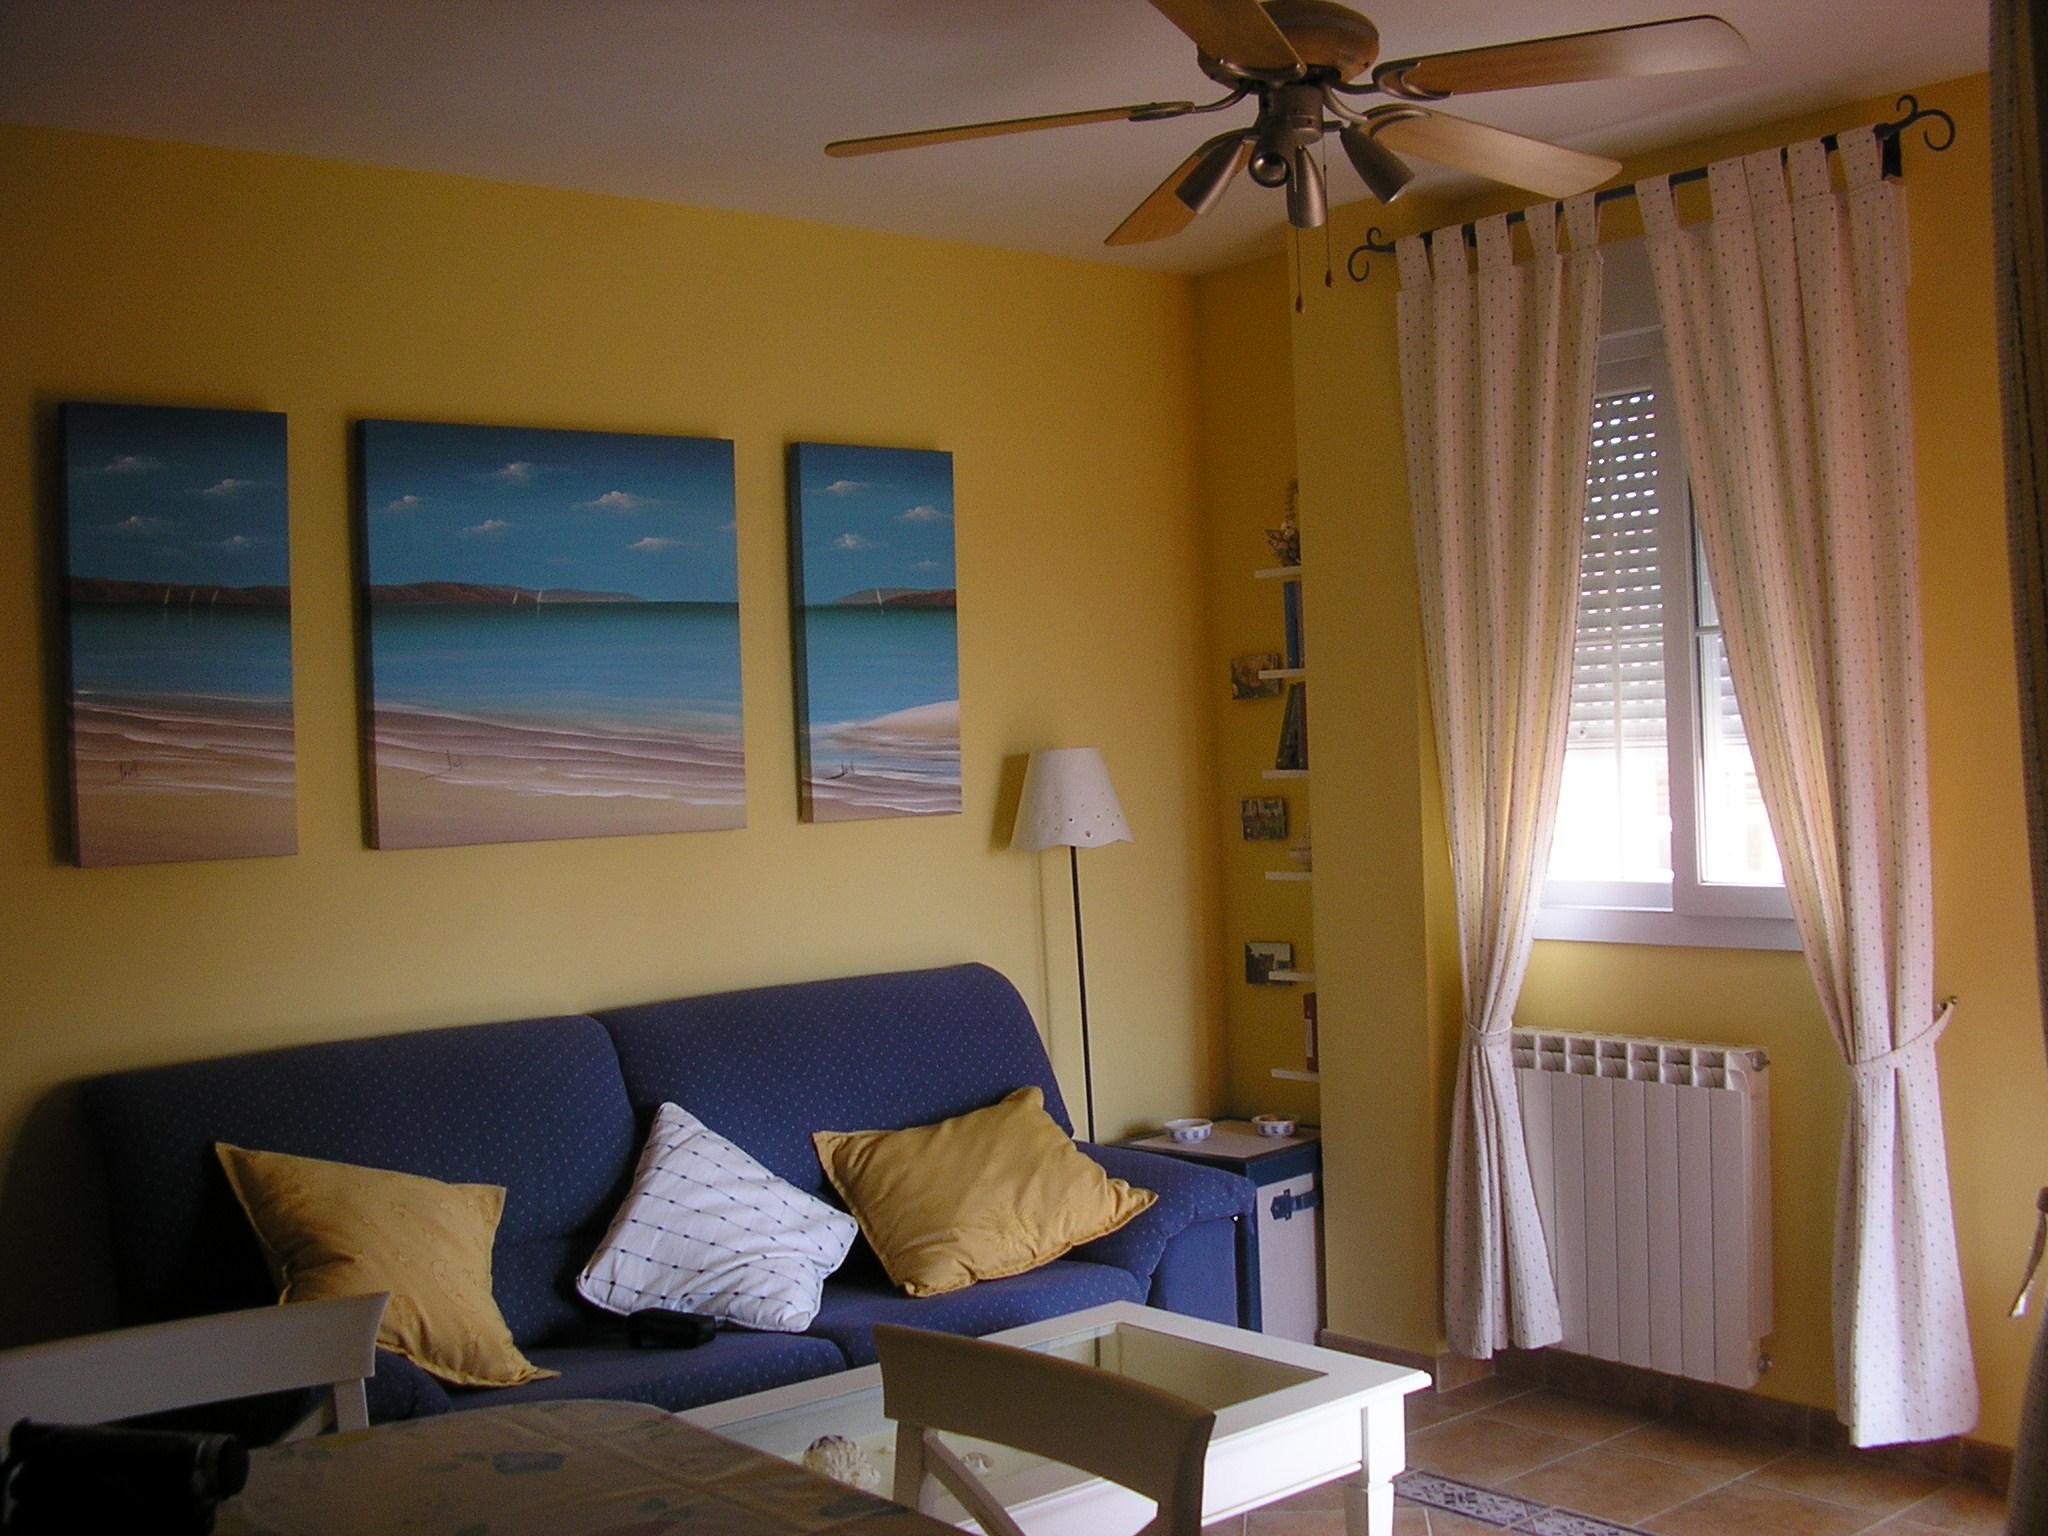 Alquiler En Urb Lomas 2 Islantilla Vft Hu 00183 Condominiums For Rent In Lepe Andalucía Spain